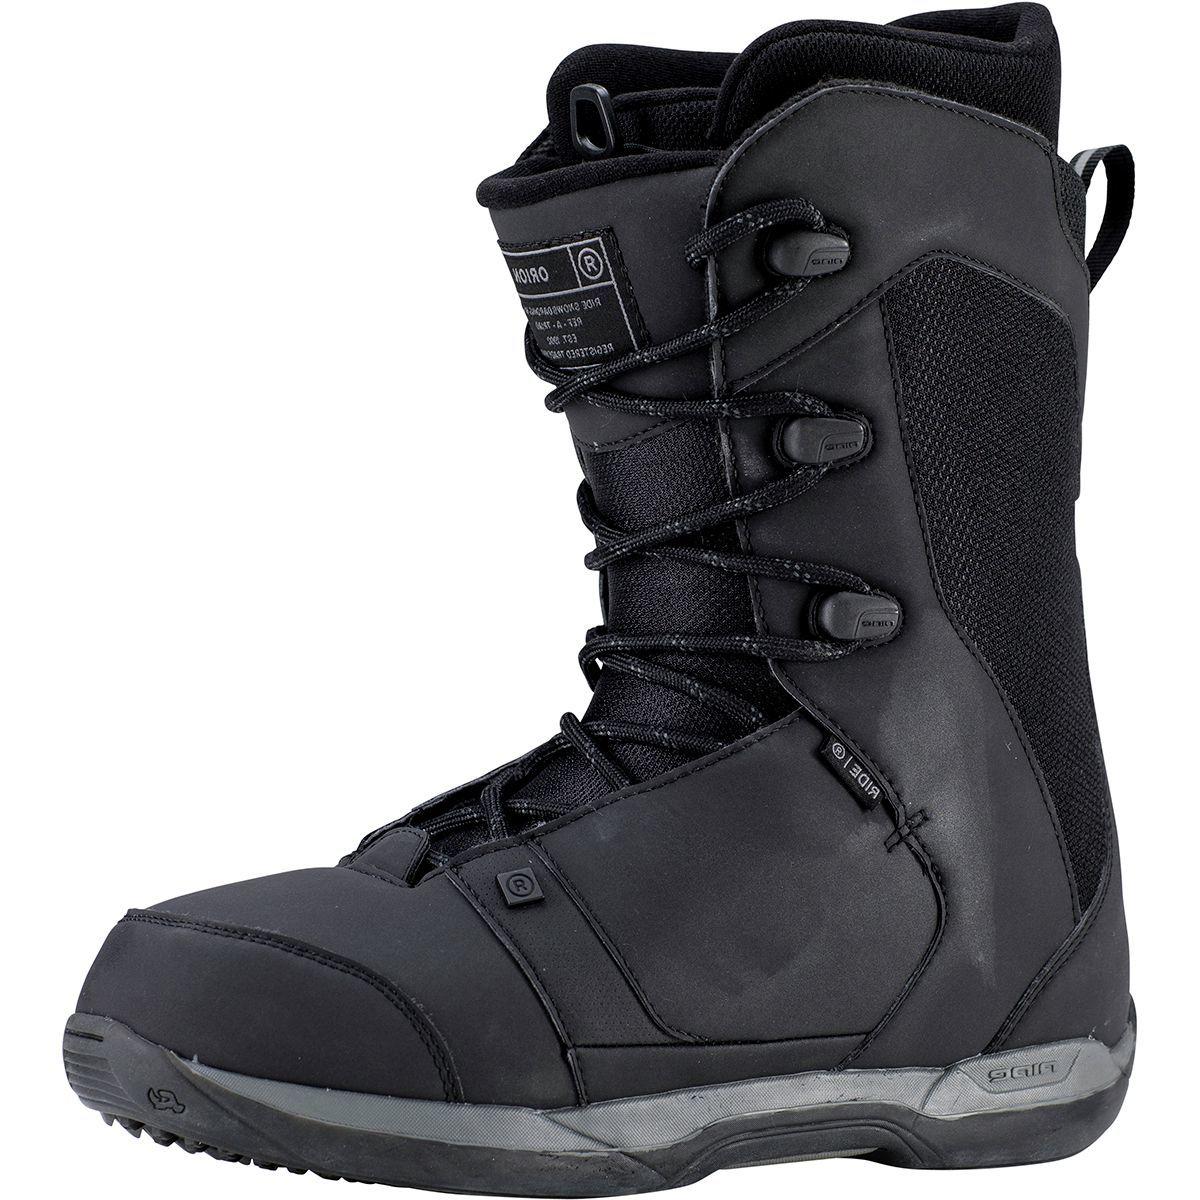 Ride Orion Snowboard Boot - Men's